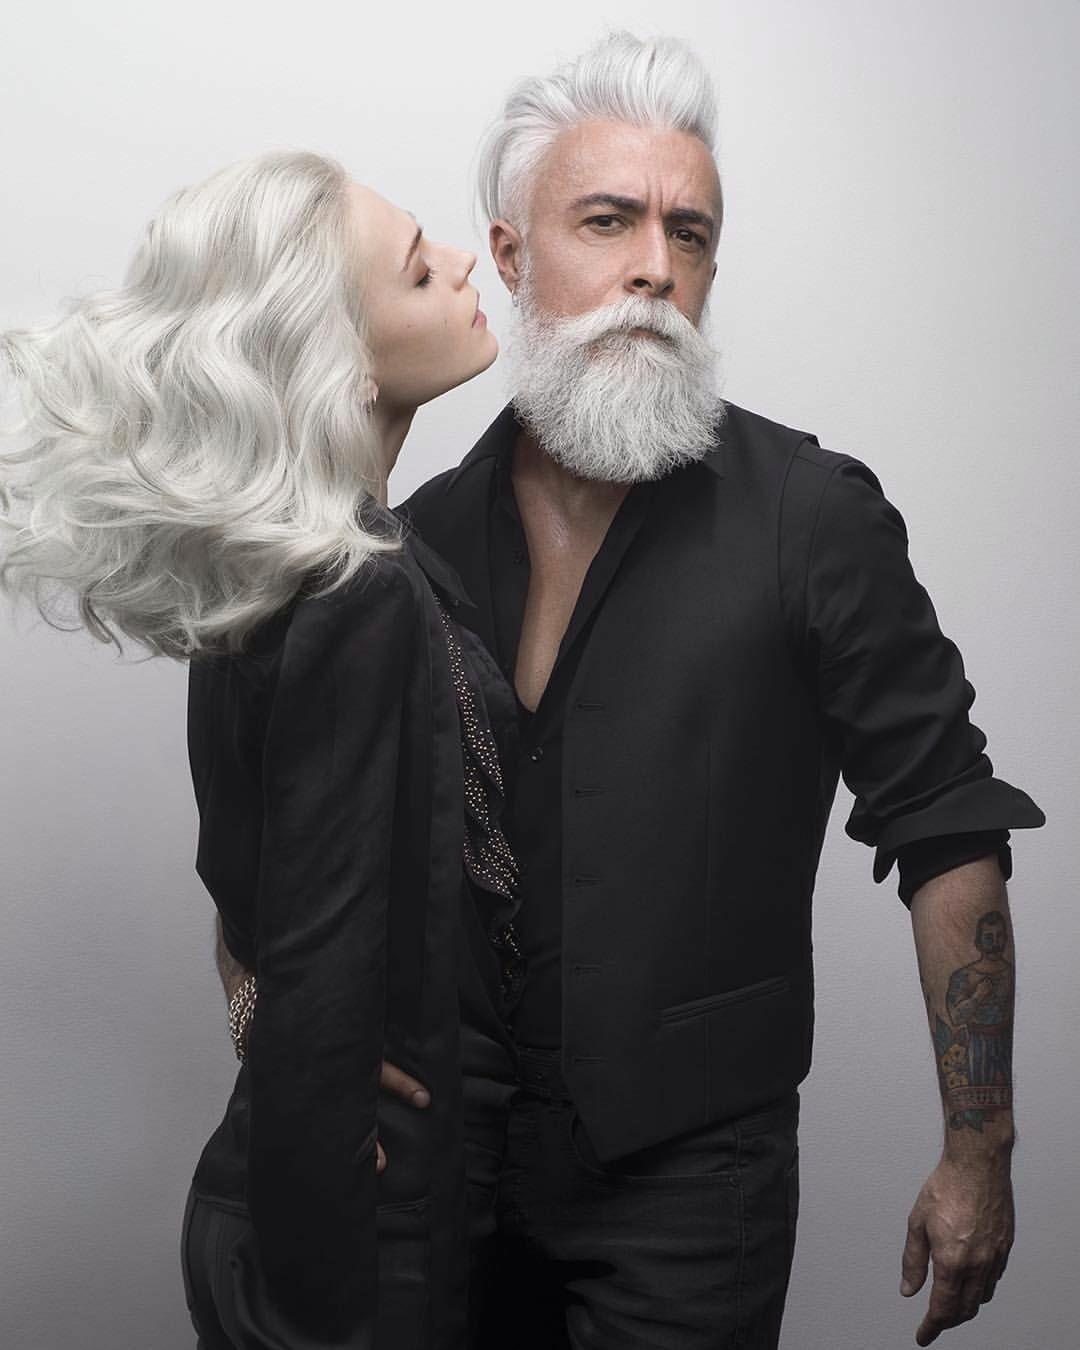 executive spice beard balm men 39 s style pinterest barbe cheveux et cheveux blancs. Black Bedroom Furniture Sets. Home Design Ideas